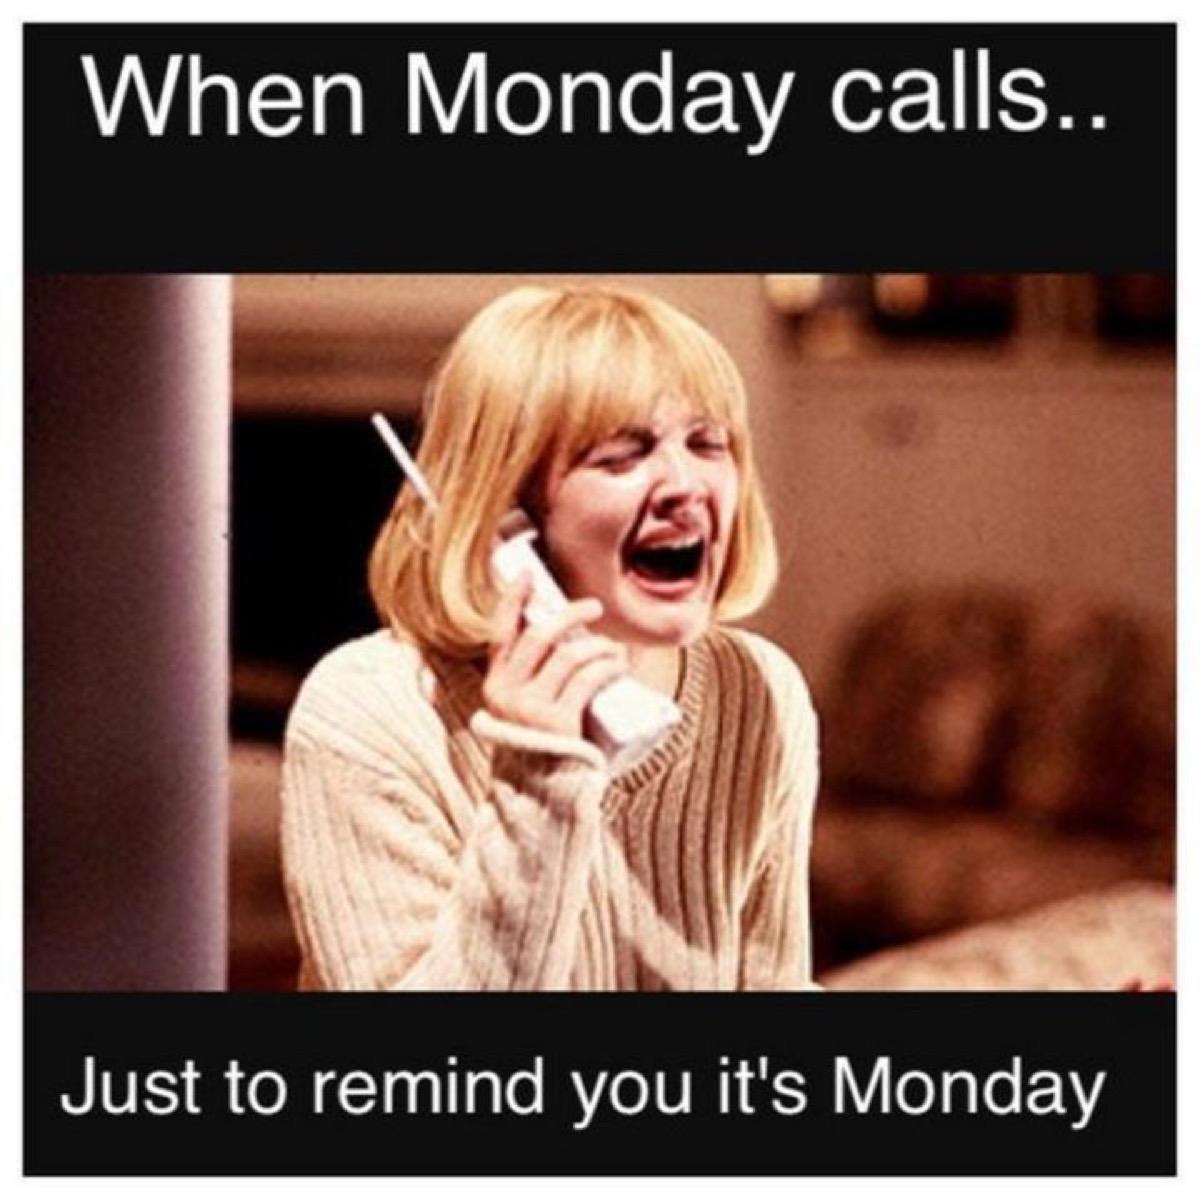 Monday Scream meme